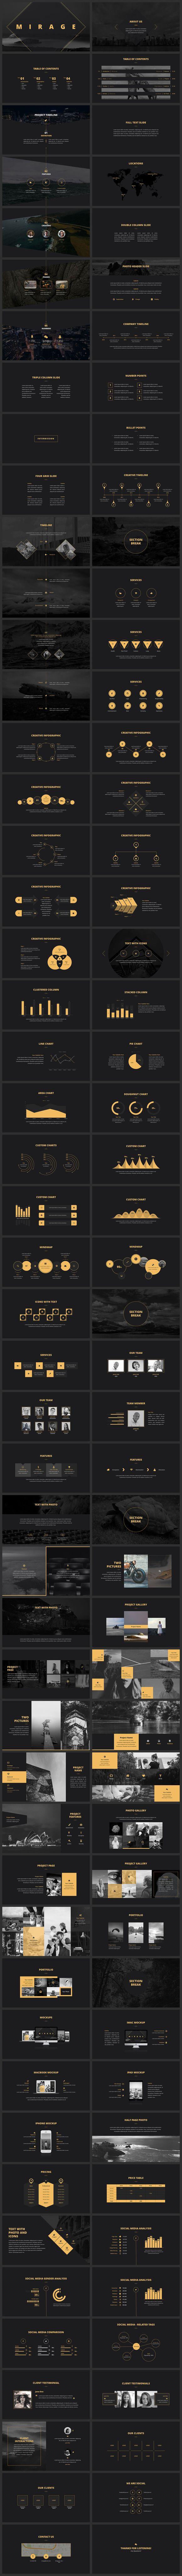 Mirage #PowerPoint #Template by SlideStation on @Creative Market creativemarket.co... #design #creative #creativity #templates #presentations #ppt #slide